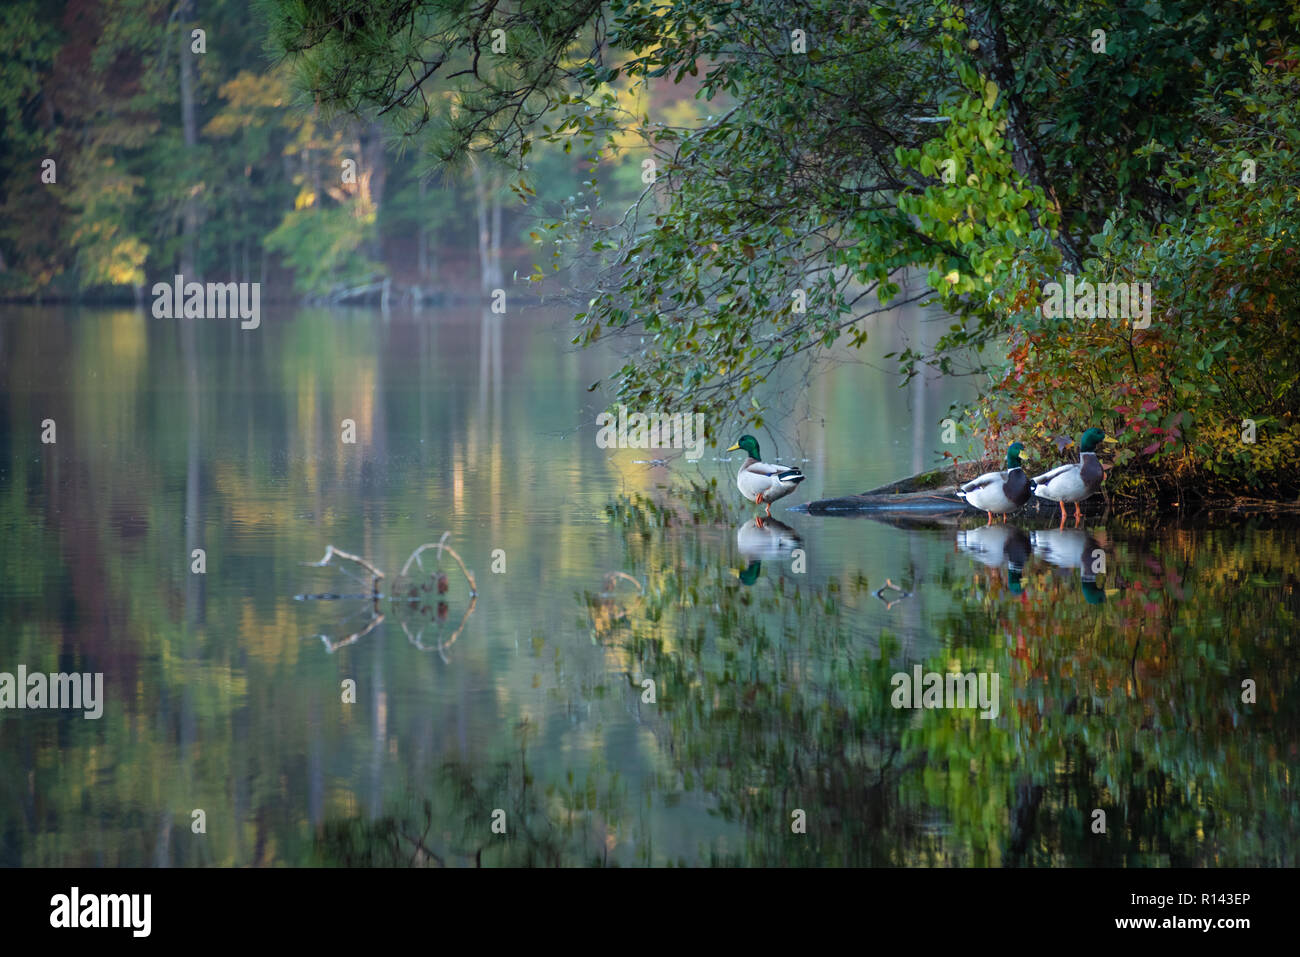 Mallard Ducks Wading Along The Shoreline Of The Glassy Calm Stone